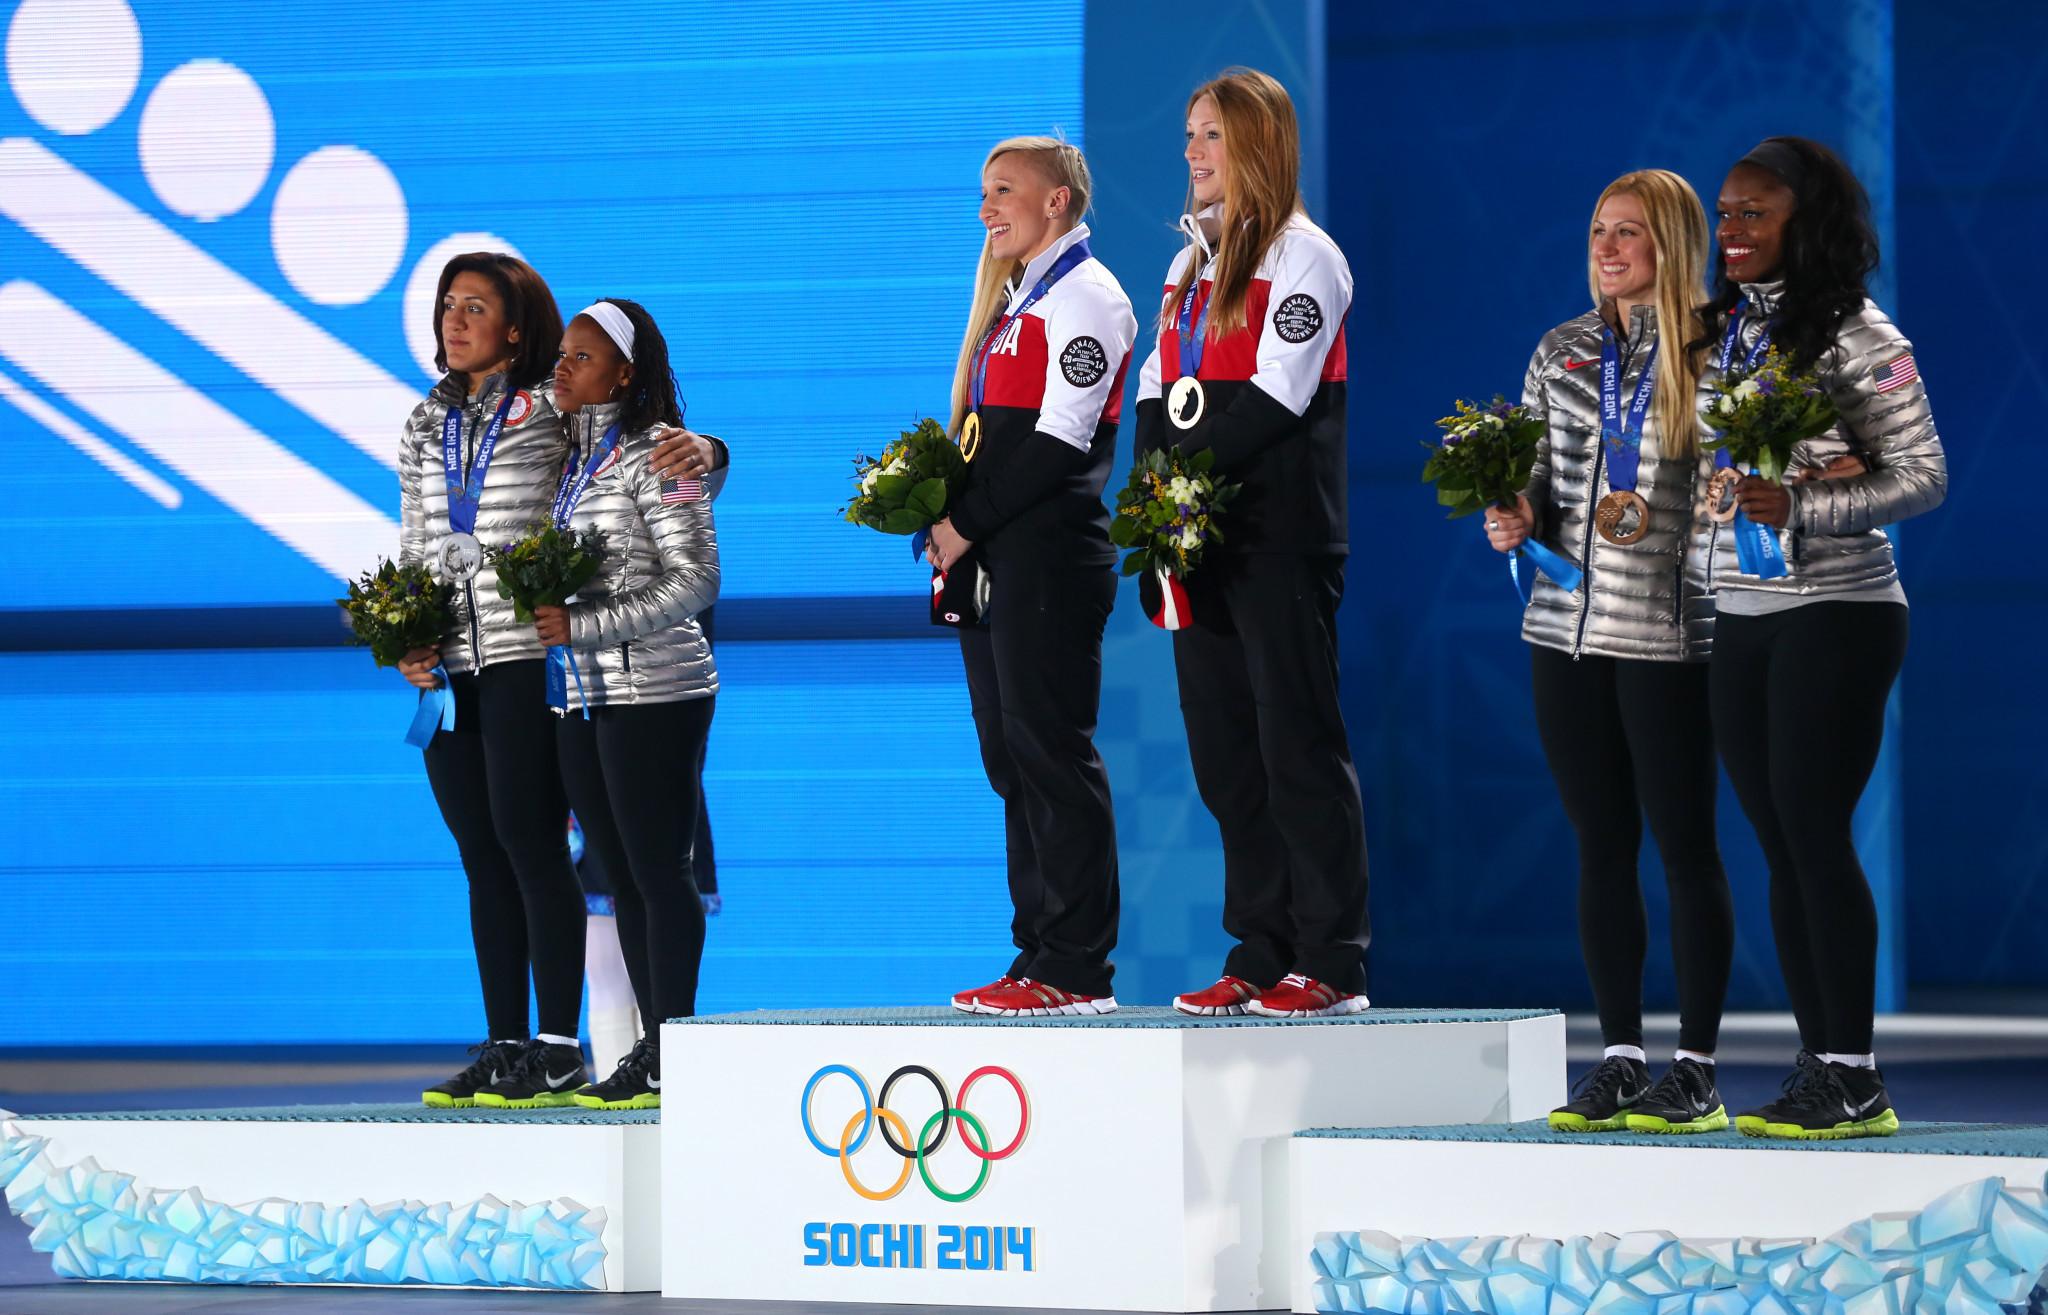 Canadian athletes set to sing gender neutral national anthem at Pyeongchang 2018 after Senate approves change